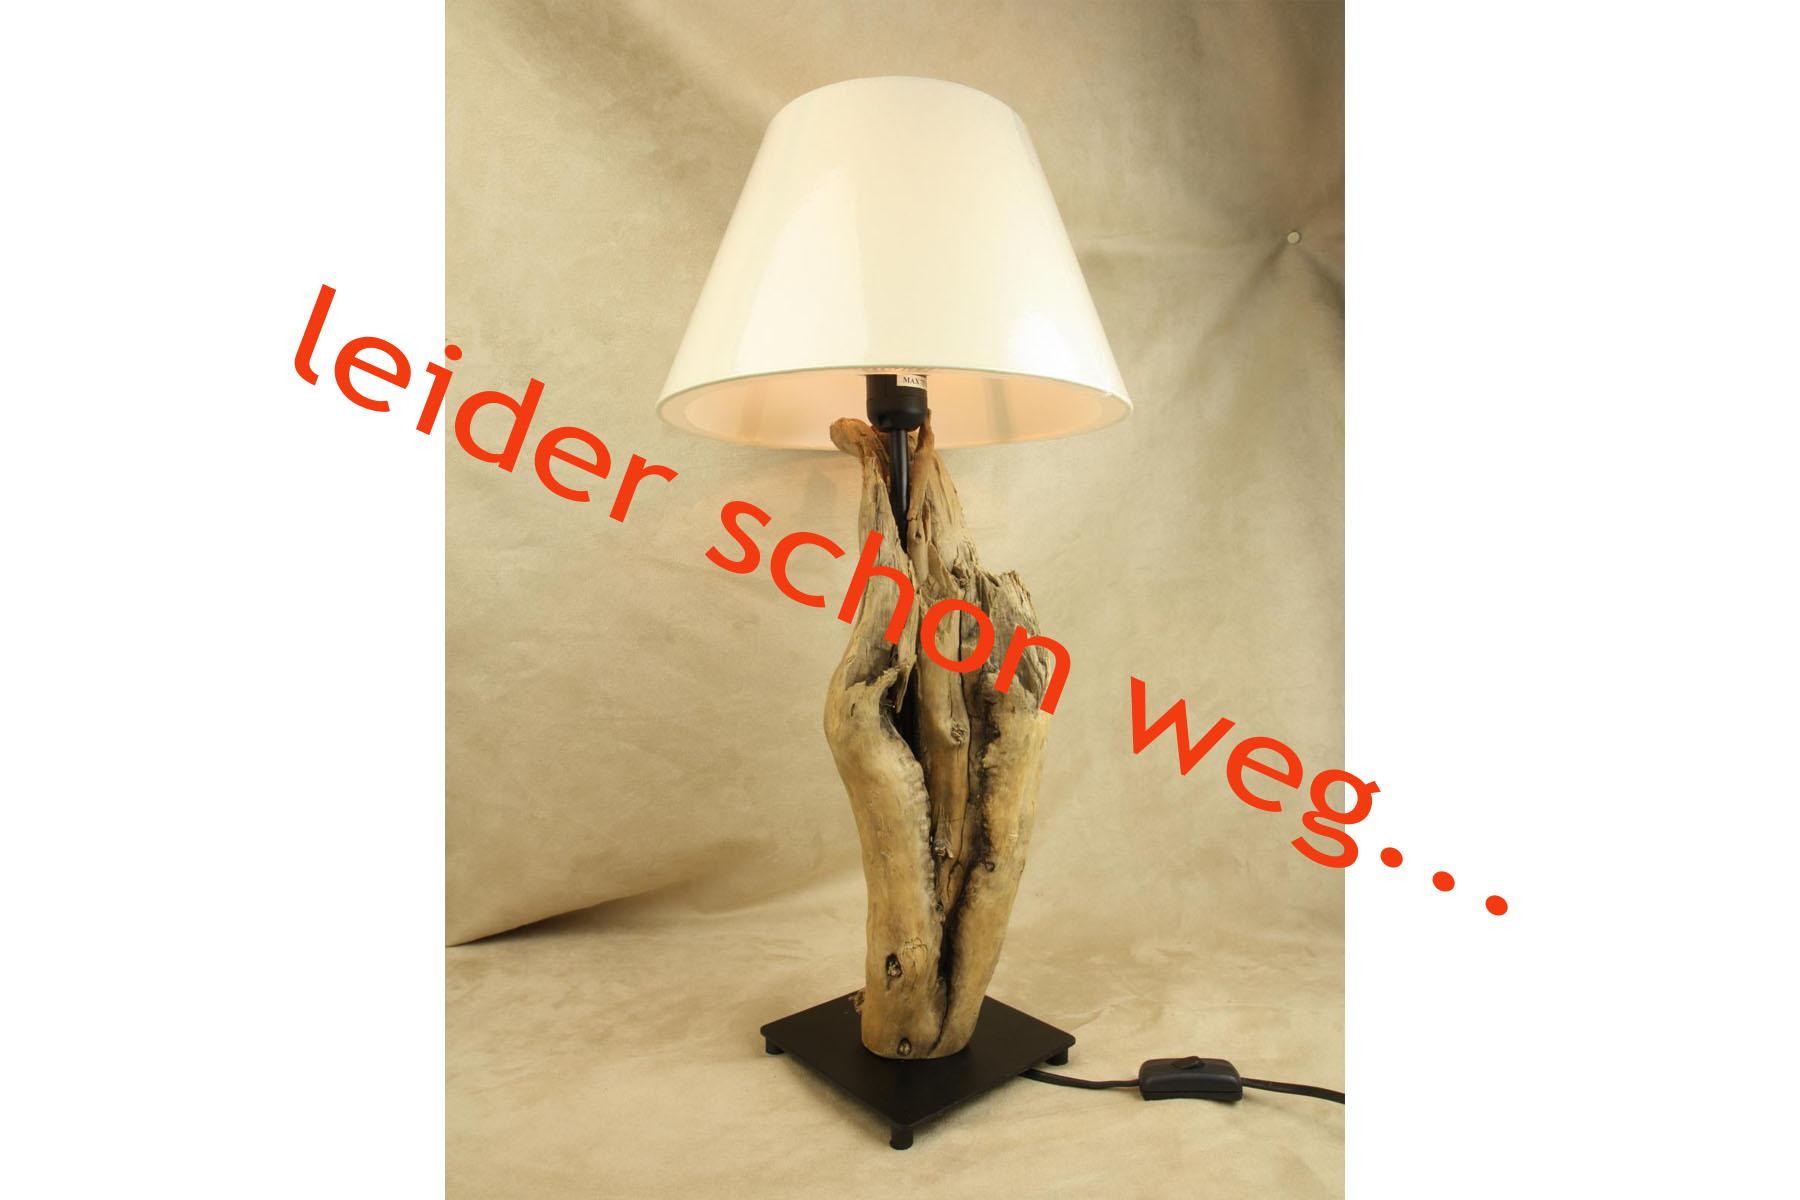 lampe stoffschirm latest honsel leuchten tischlampe schirm muranoglas with lampe stoffschirm. Black Bedroom Furniture Sets. Home Design Ideas